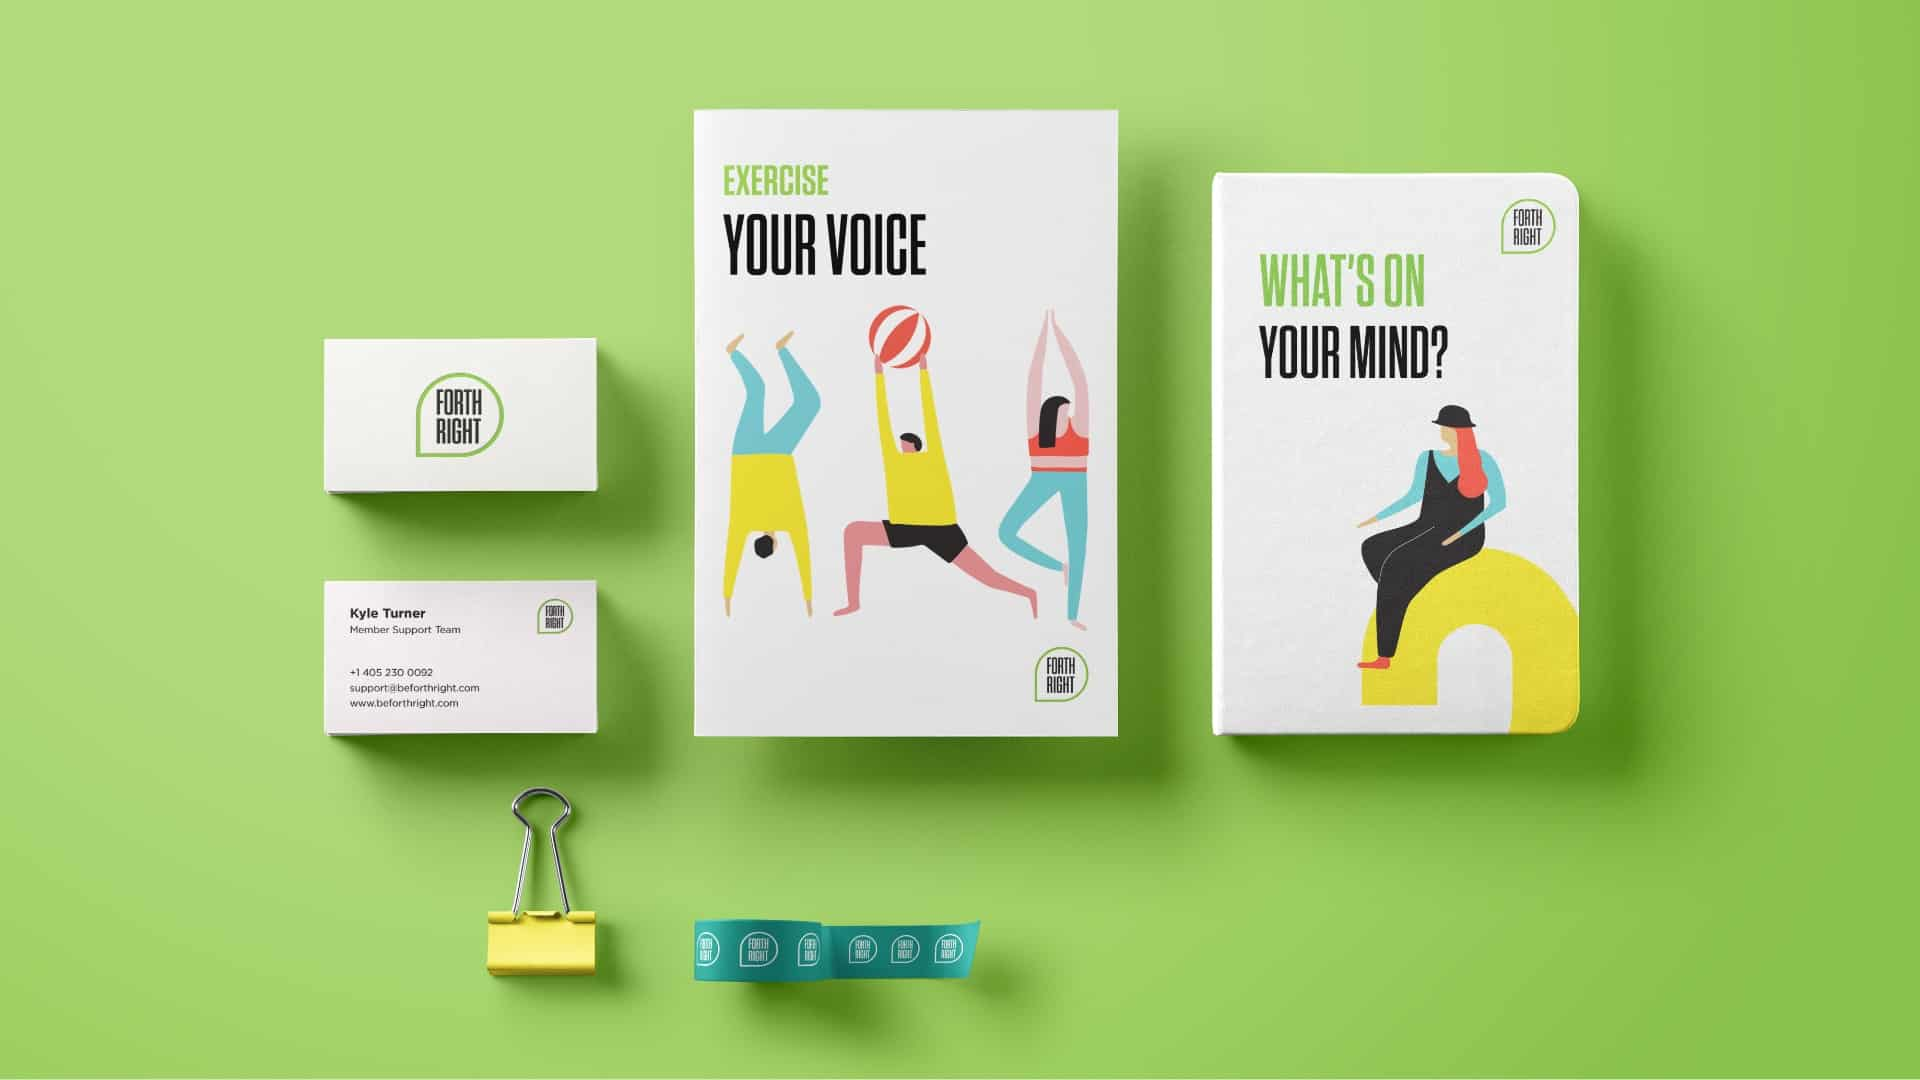 Exercise Your Voice Graphic Design - Digital Cretaive - Citizen Best